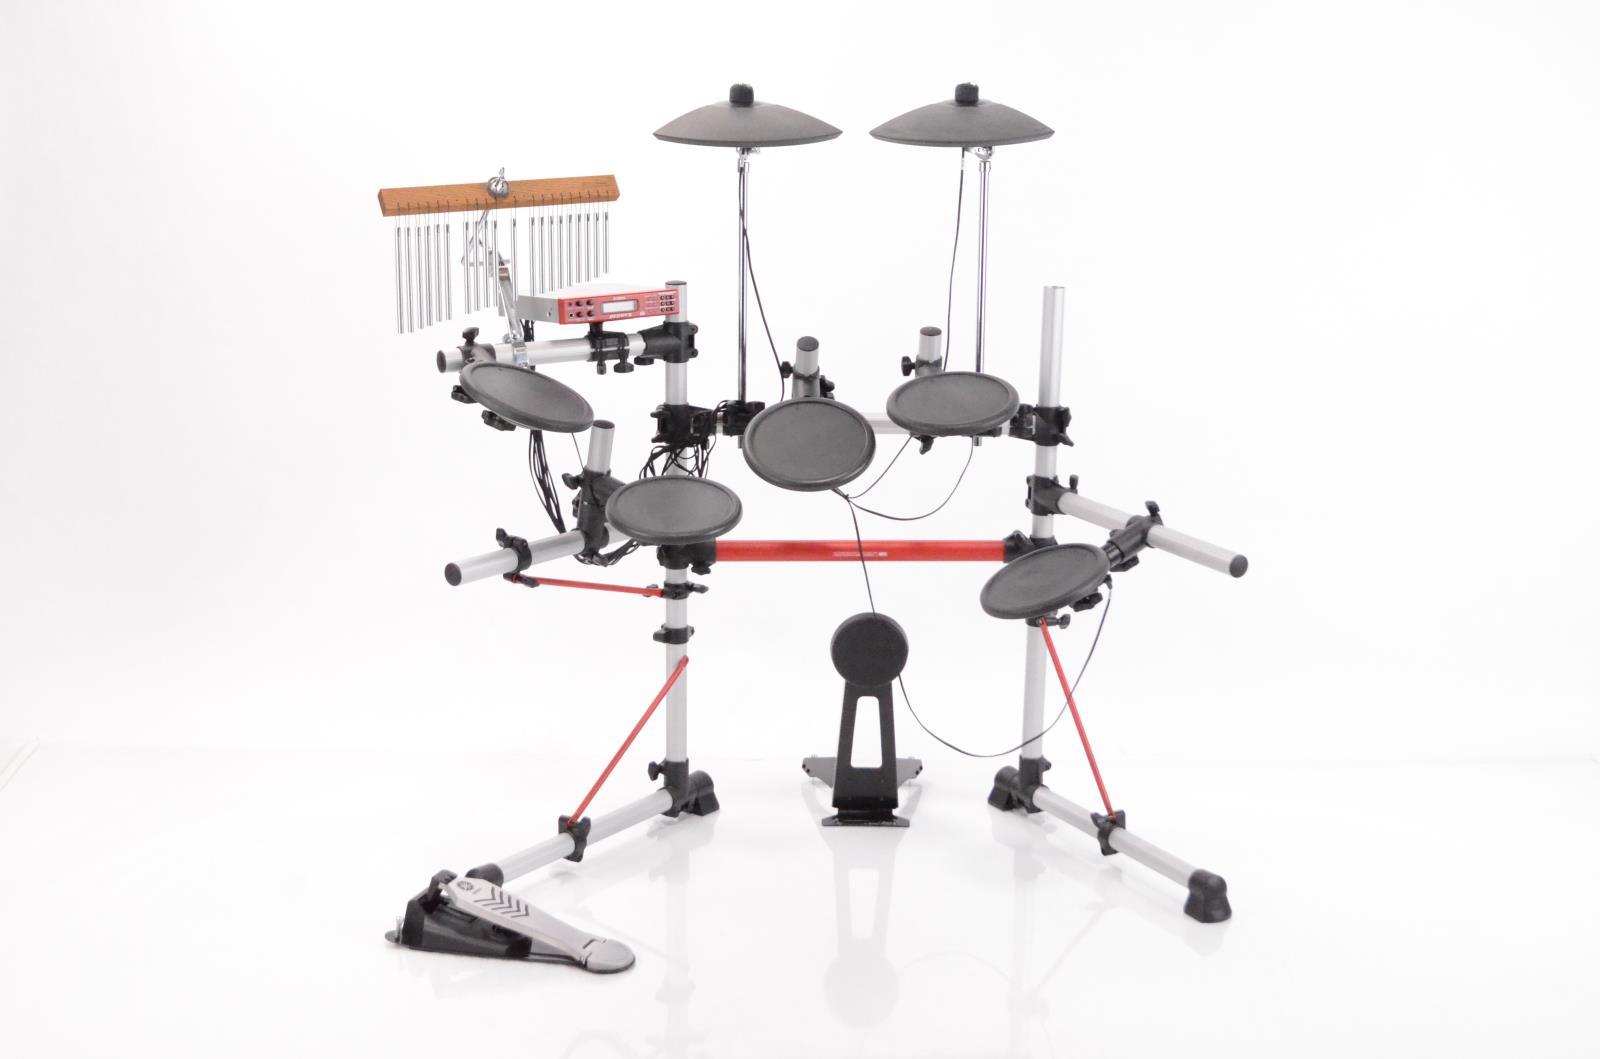 Yamaha DTXP3 6pc Electronic Trigger Pad Drum Kit Set DTXpress III Drums #33915